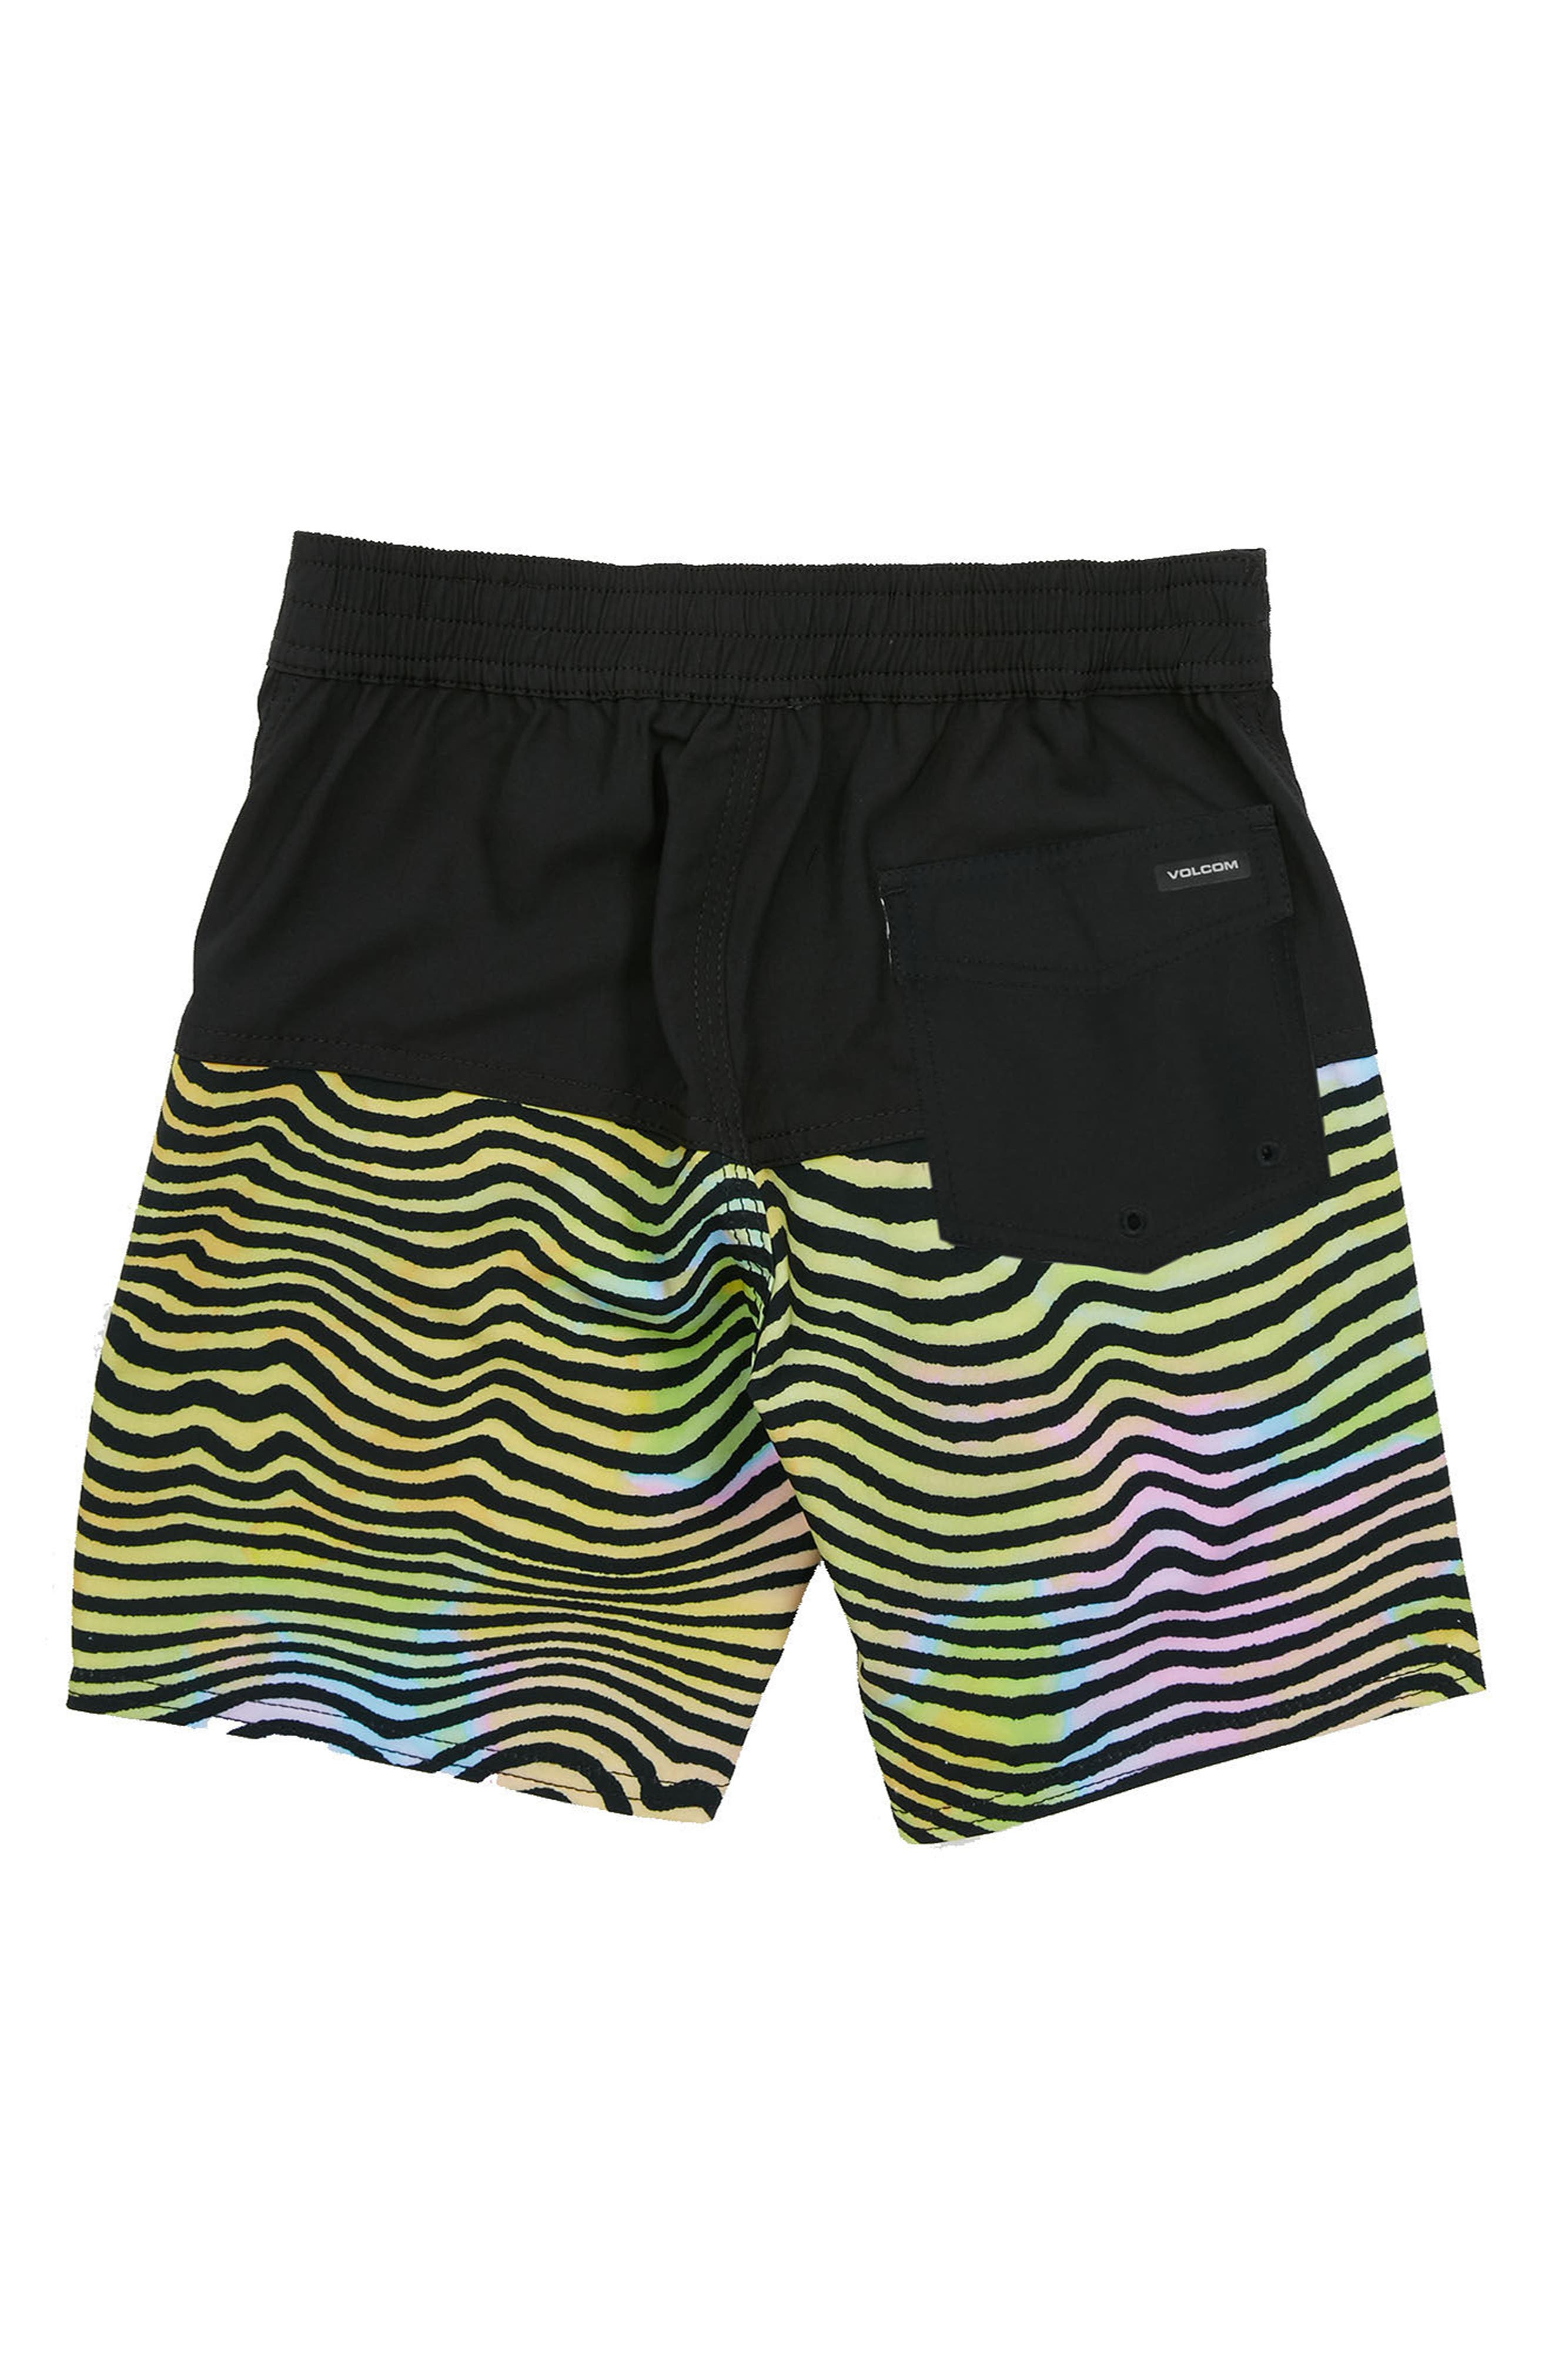 Vibes Board Shorts,                             Alternate thumbnail 2, color,                             001